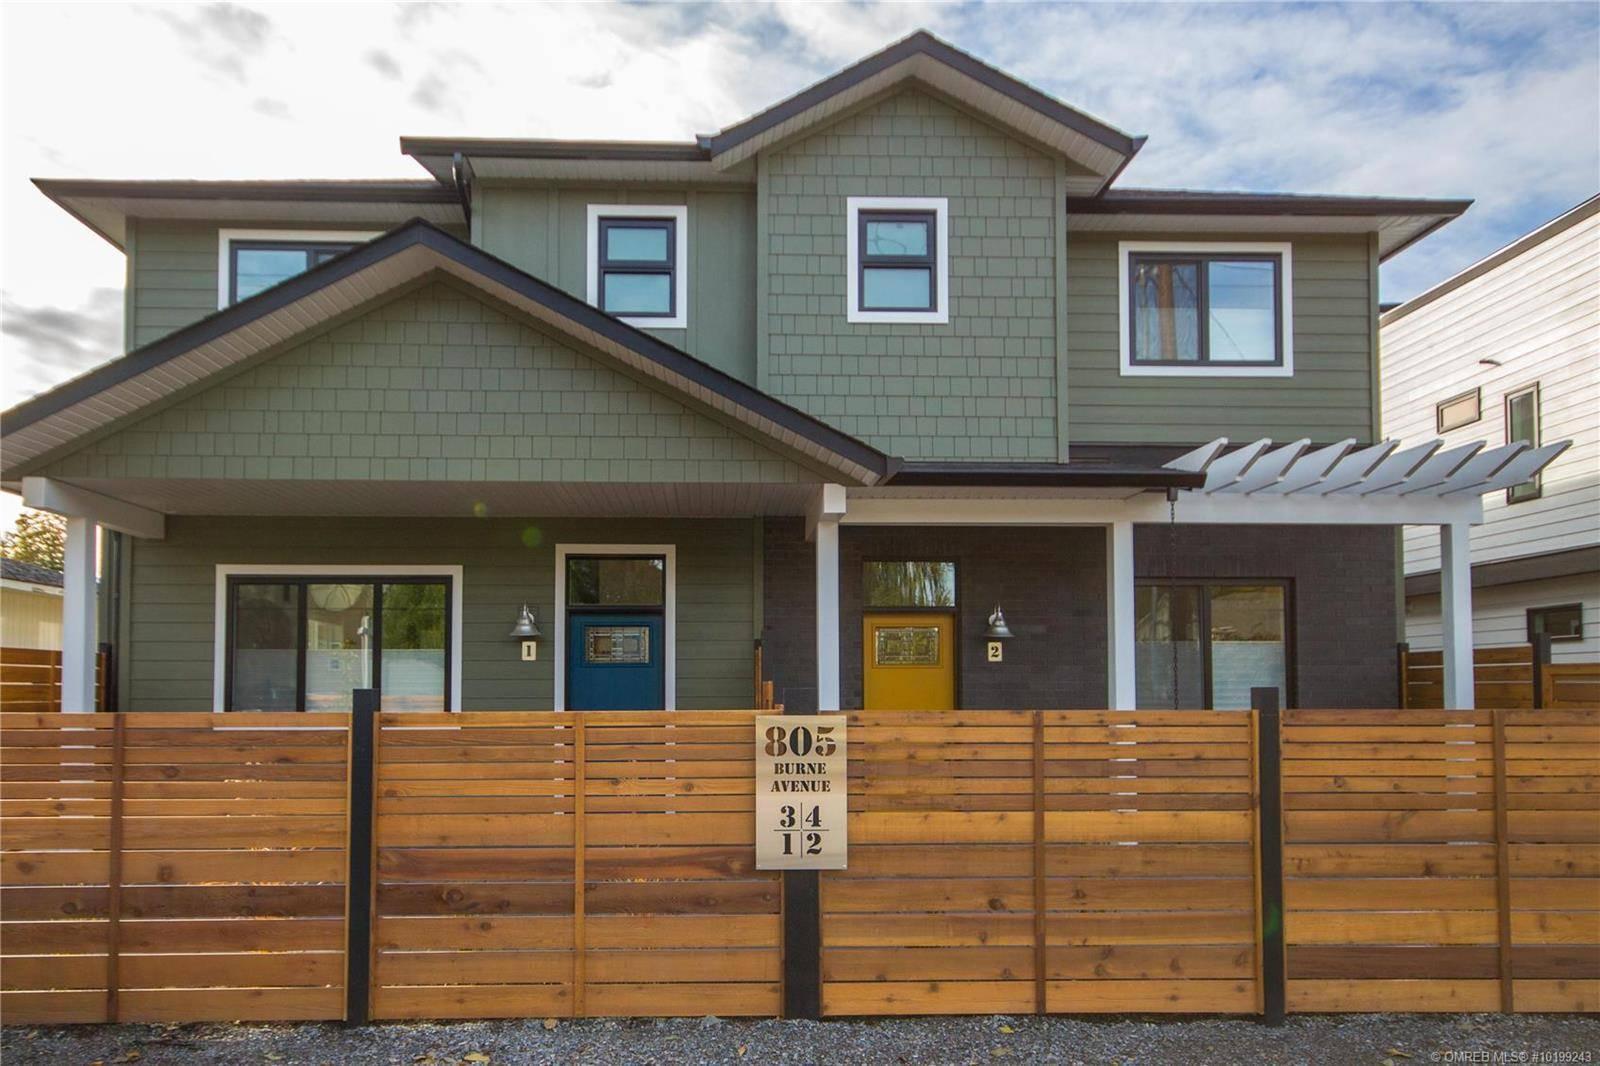 Townhouse for sale at 805 Burne Ave Unit 2 Kelowna British Columbia - MLS: 10199243